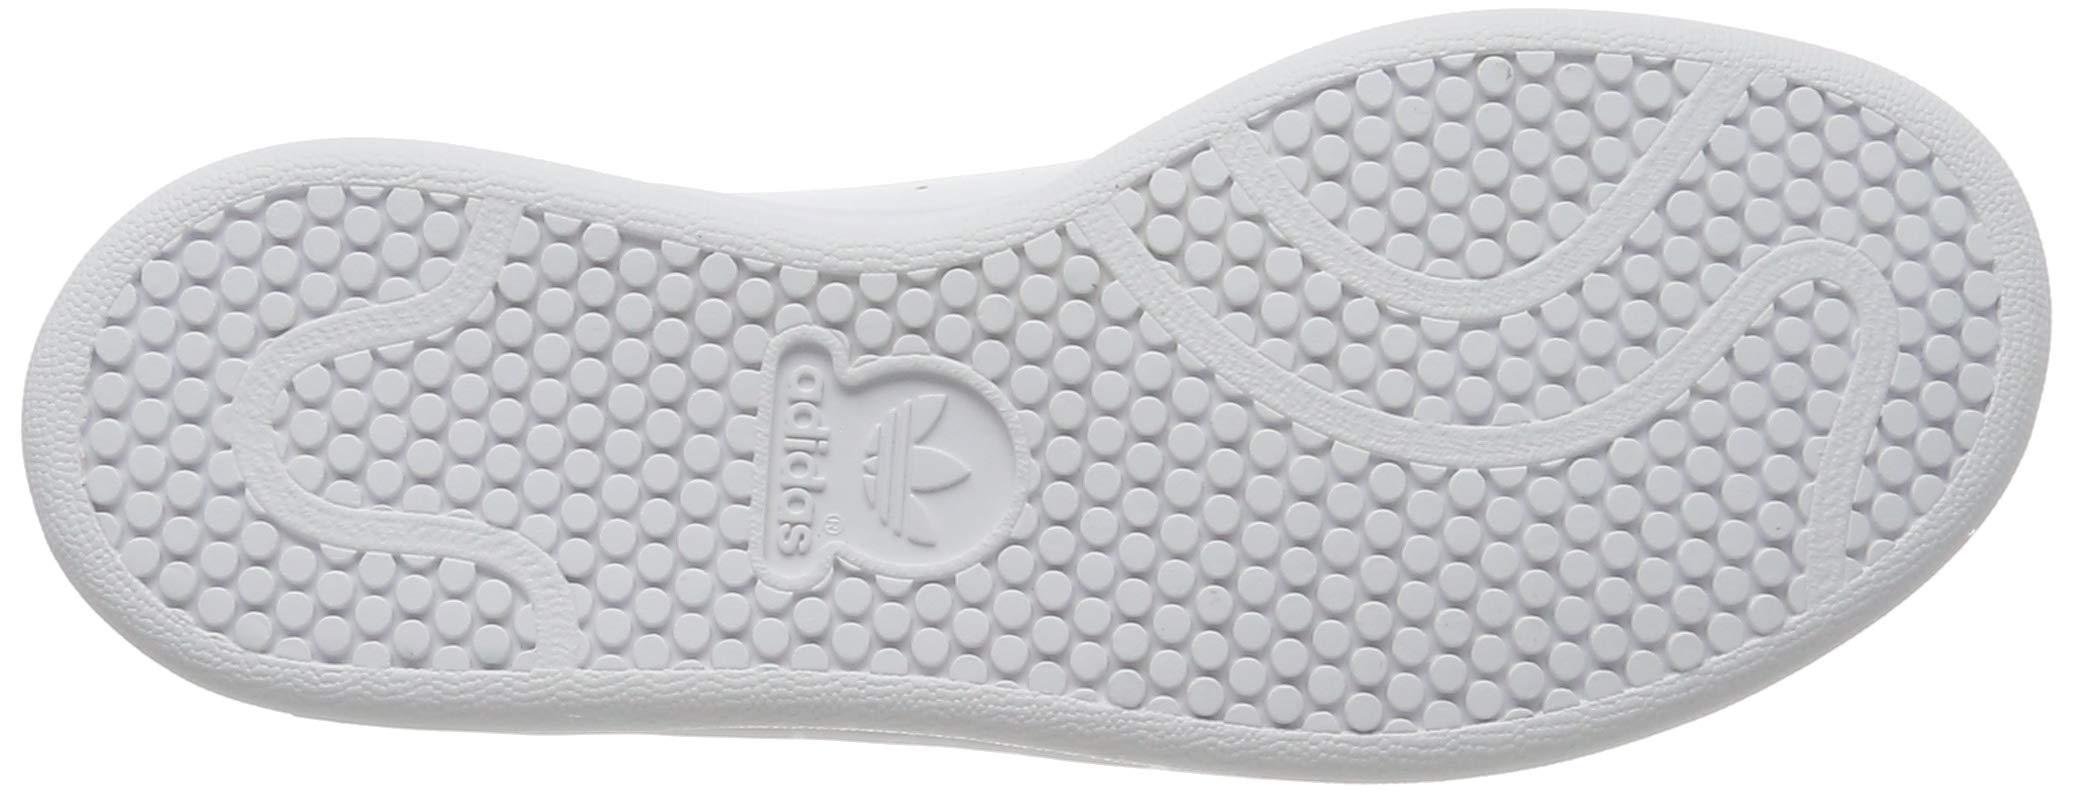 adidas Stan Smith C, Scarpe da Ginnastica Unisex – Bambini 3 spesavip